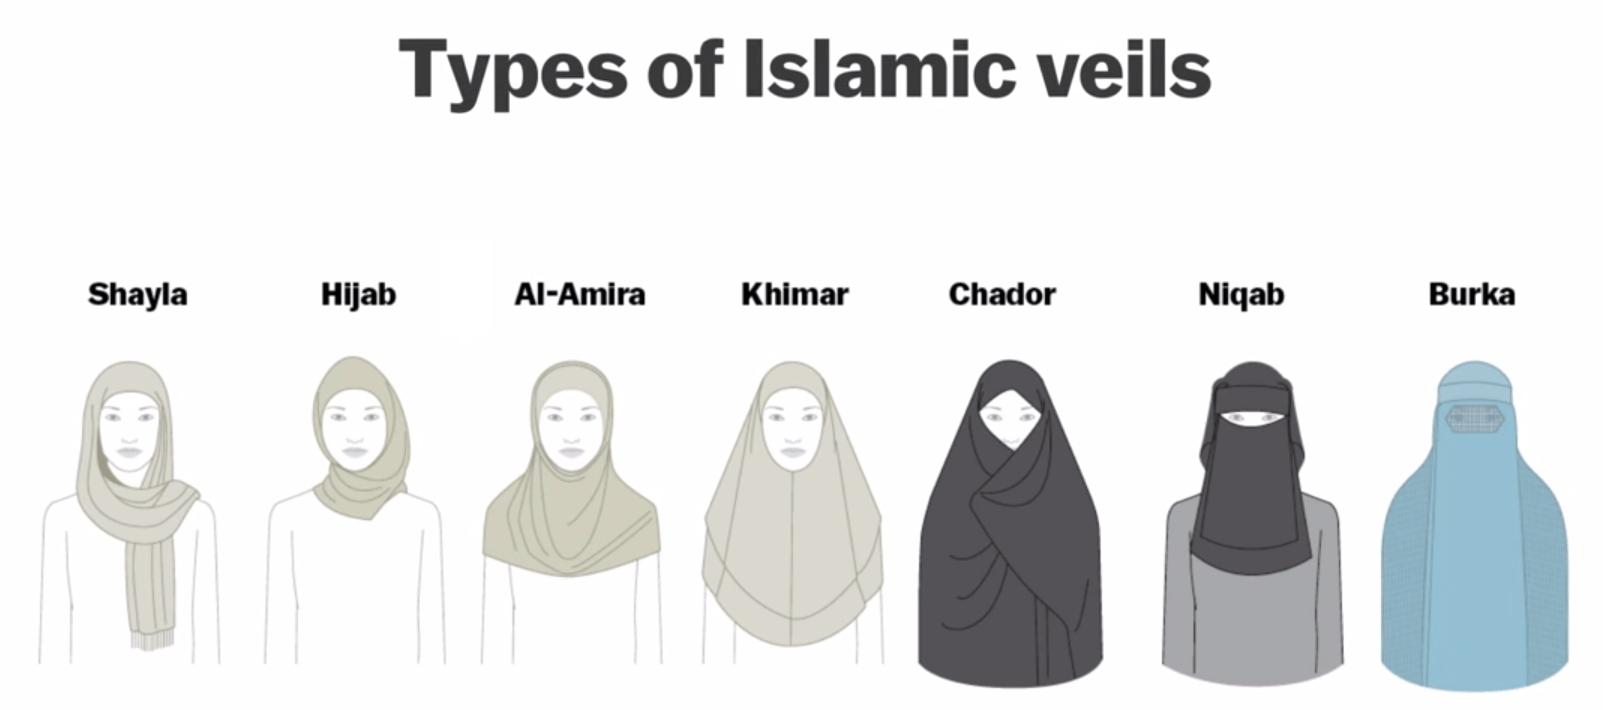 Types-of-Islamic-veils